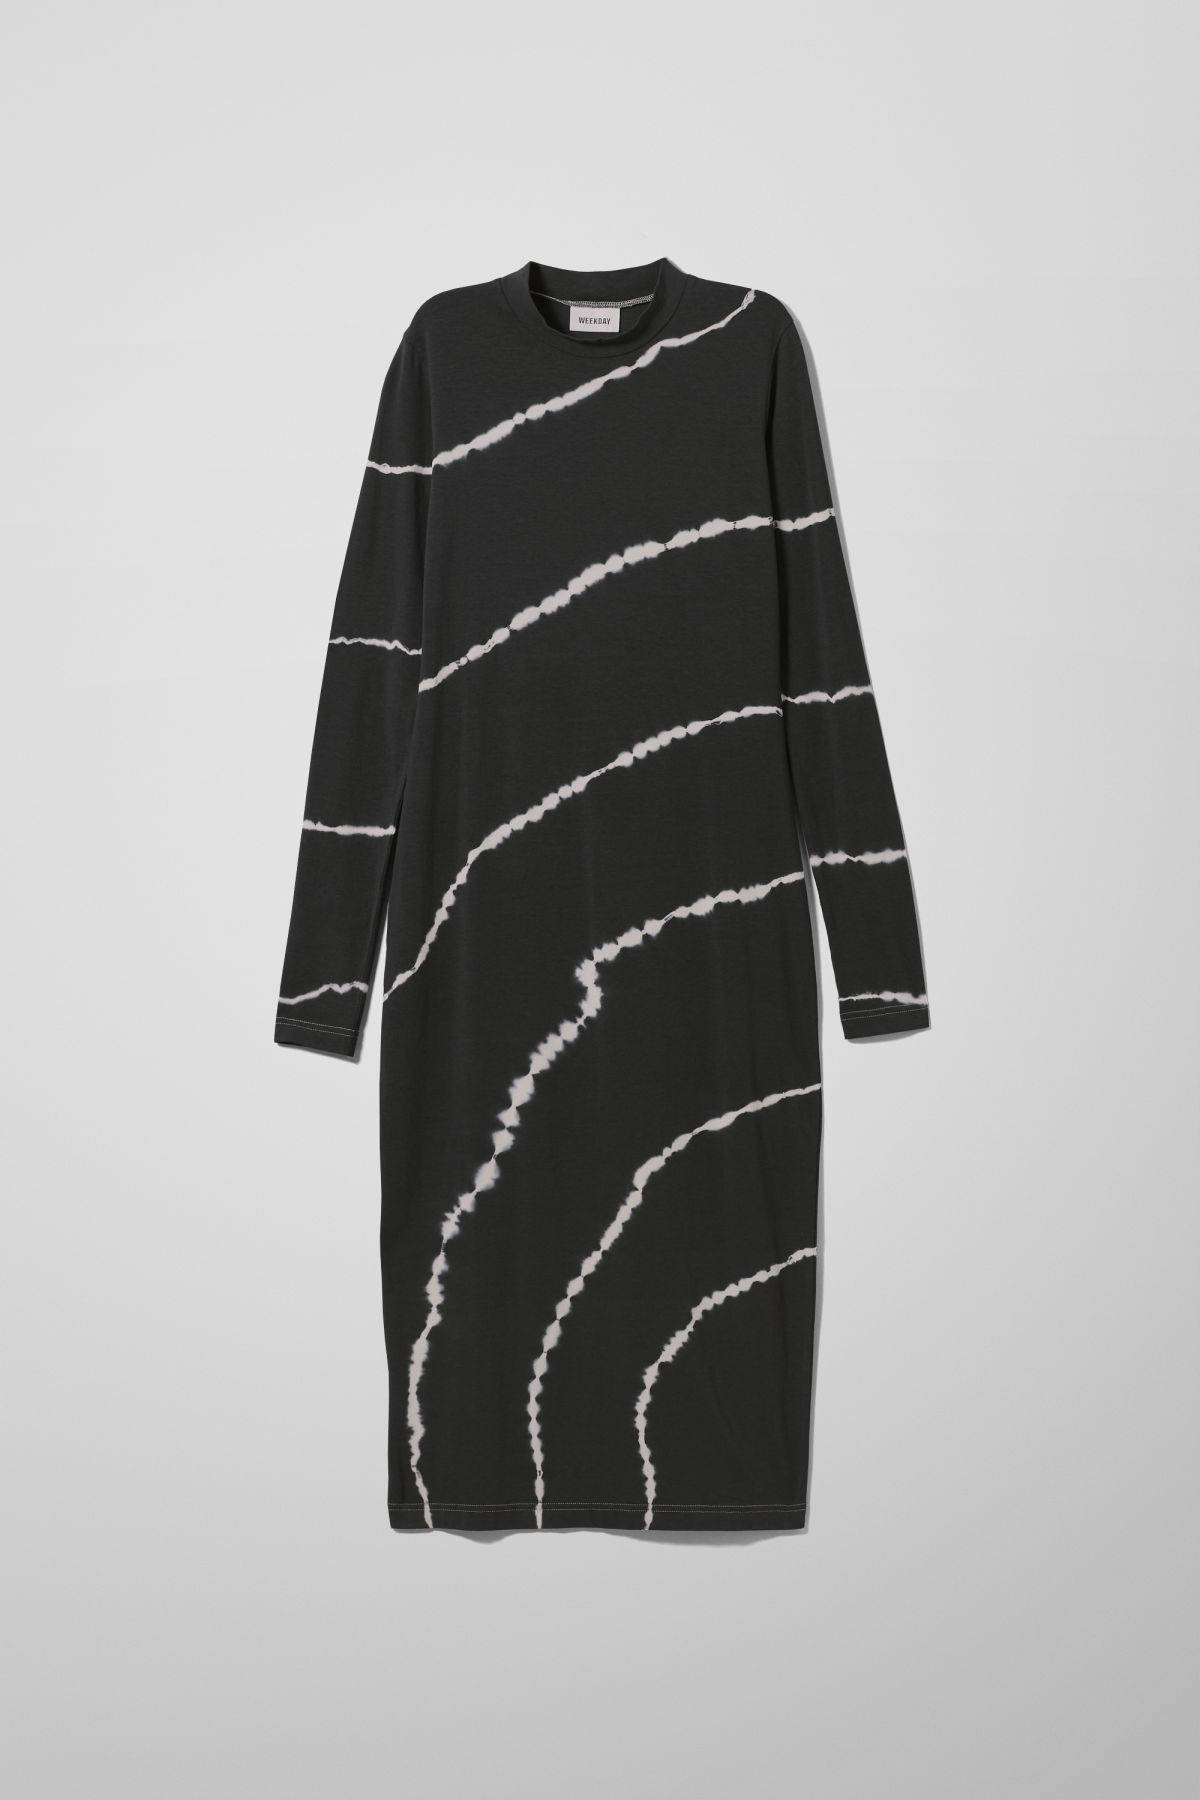 Image of Meja Dress - Black-M